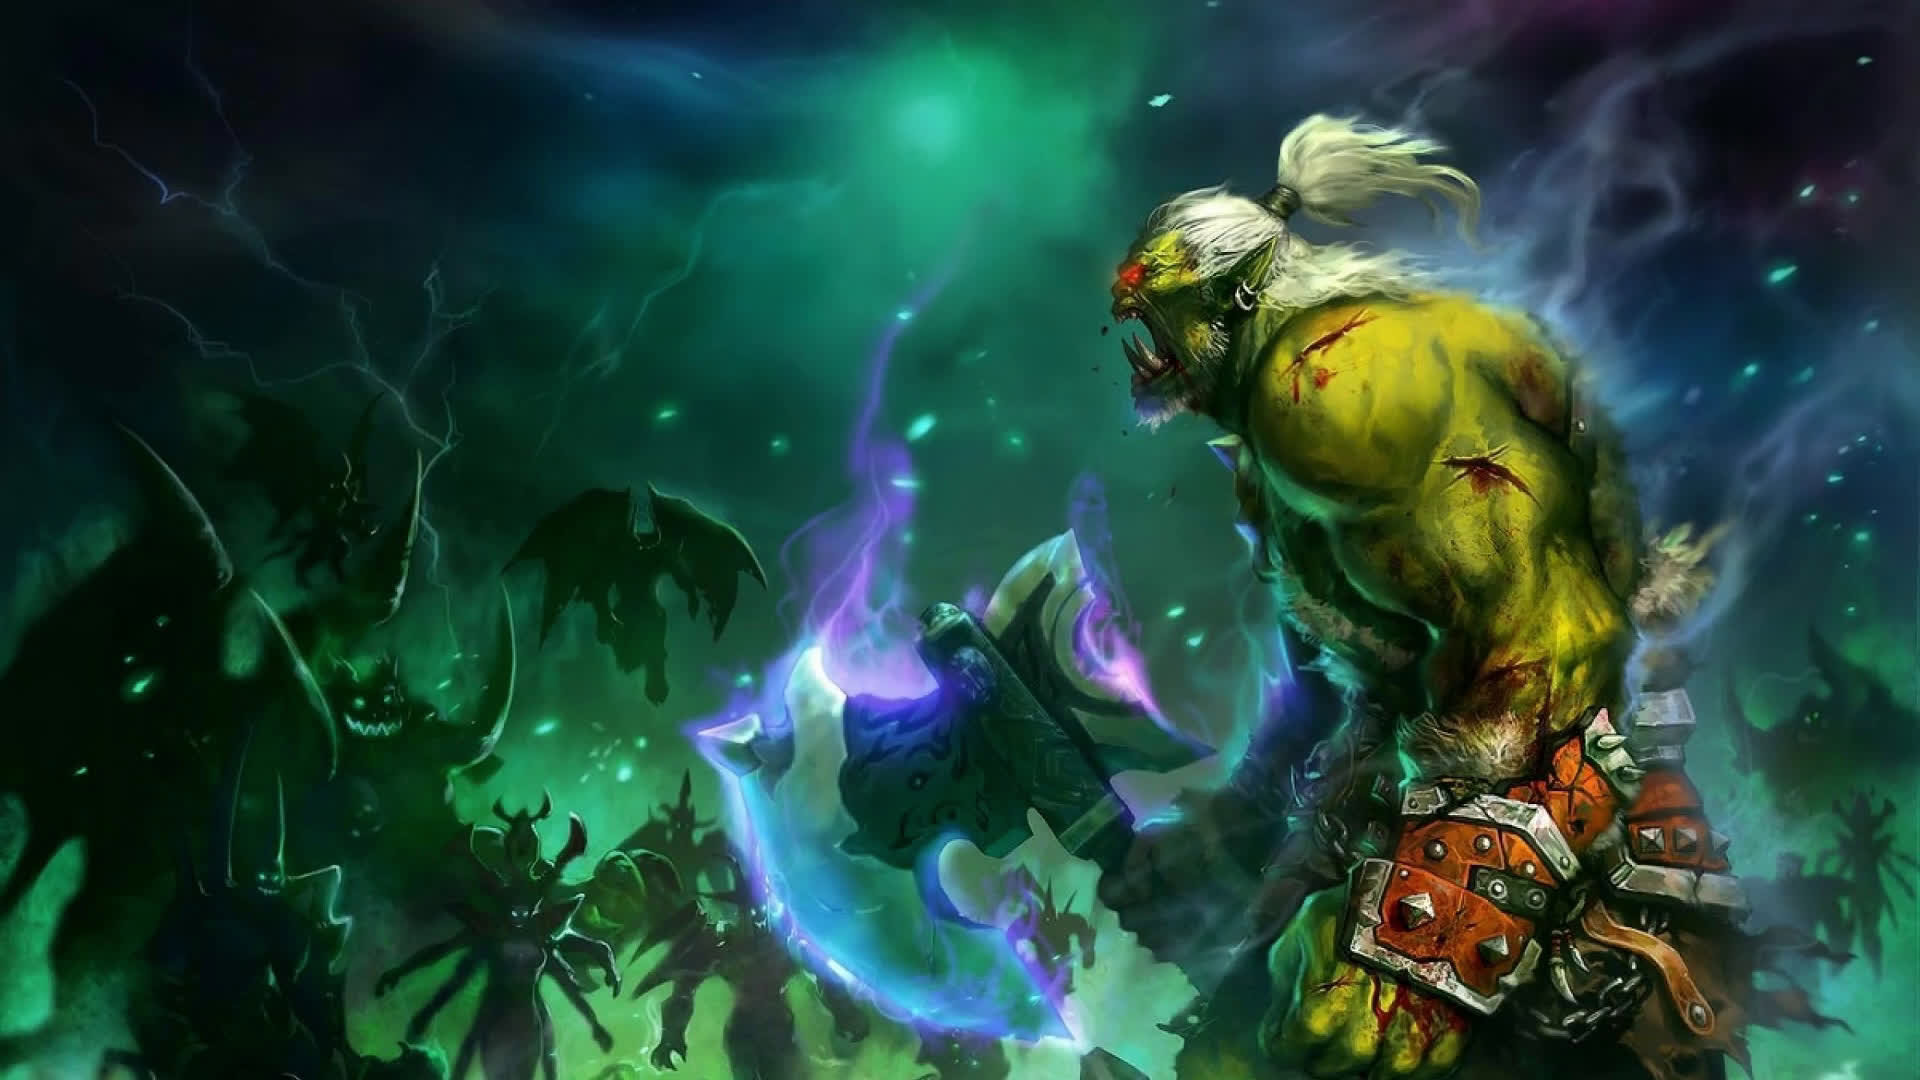 1920x1080 World Of Warcraft Warrior Orc Live Wallpaper Broxigar